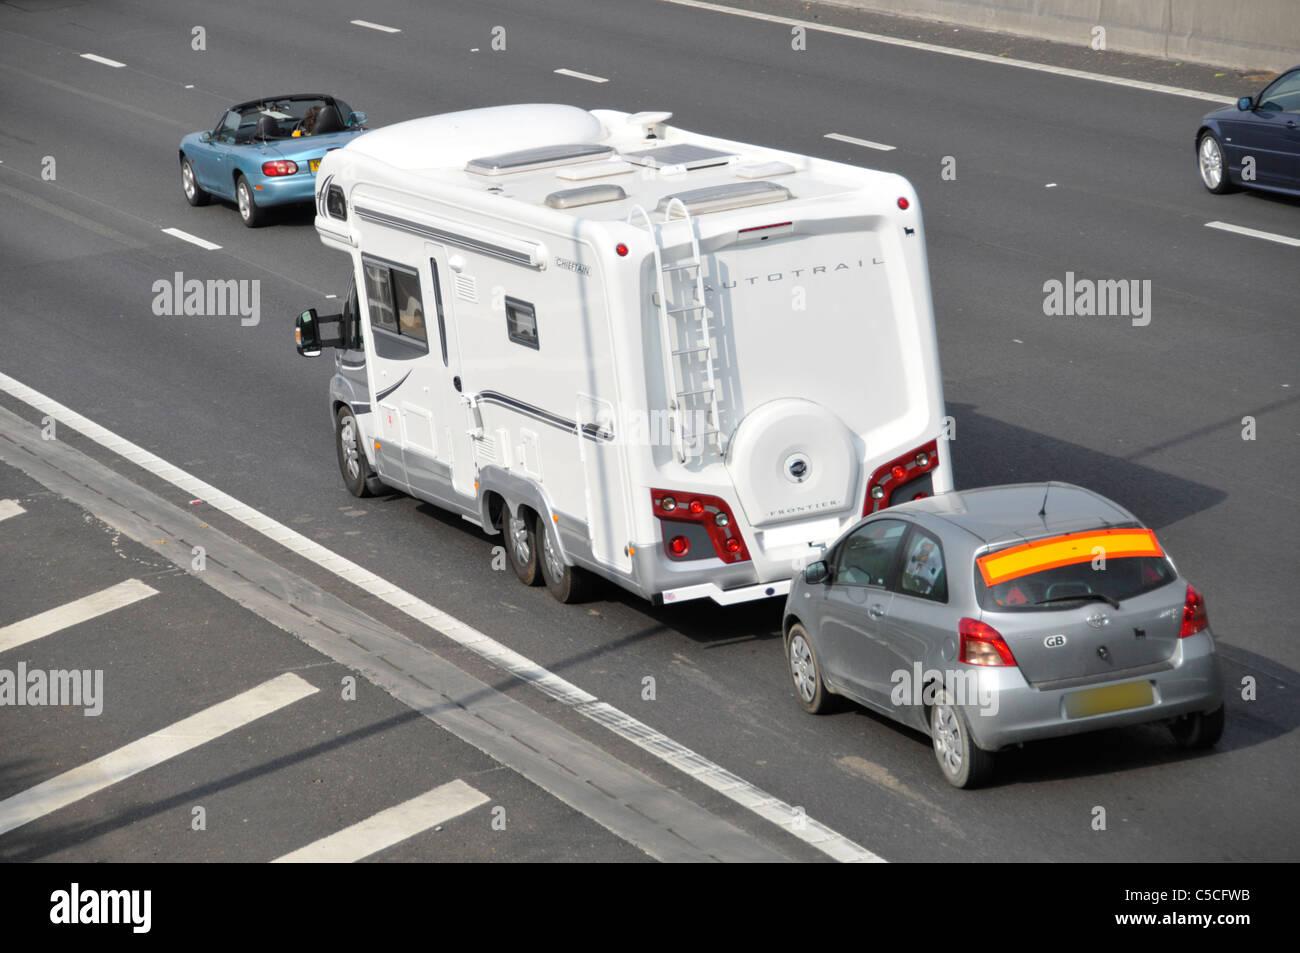 Toyota Car Back Stockfotos & Toyota Car Back Bilder - Alamy